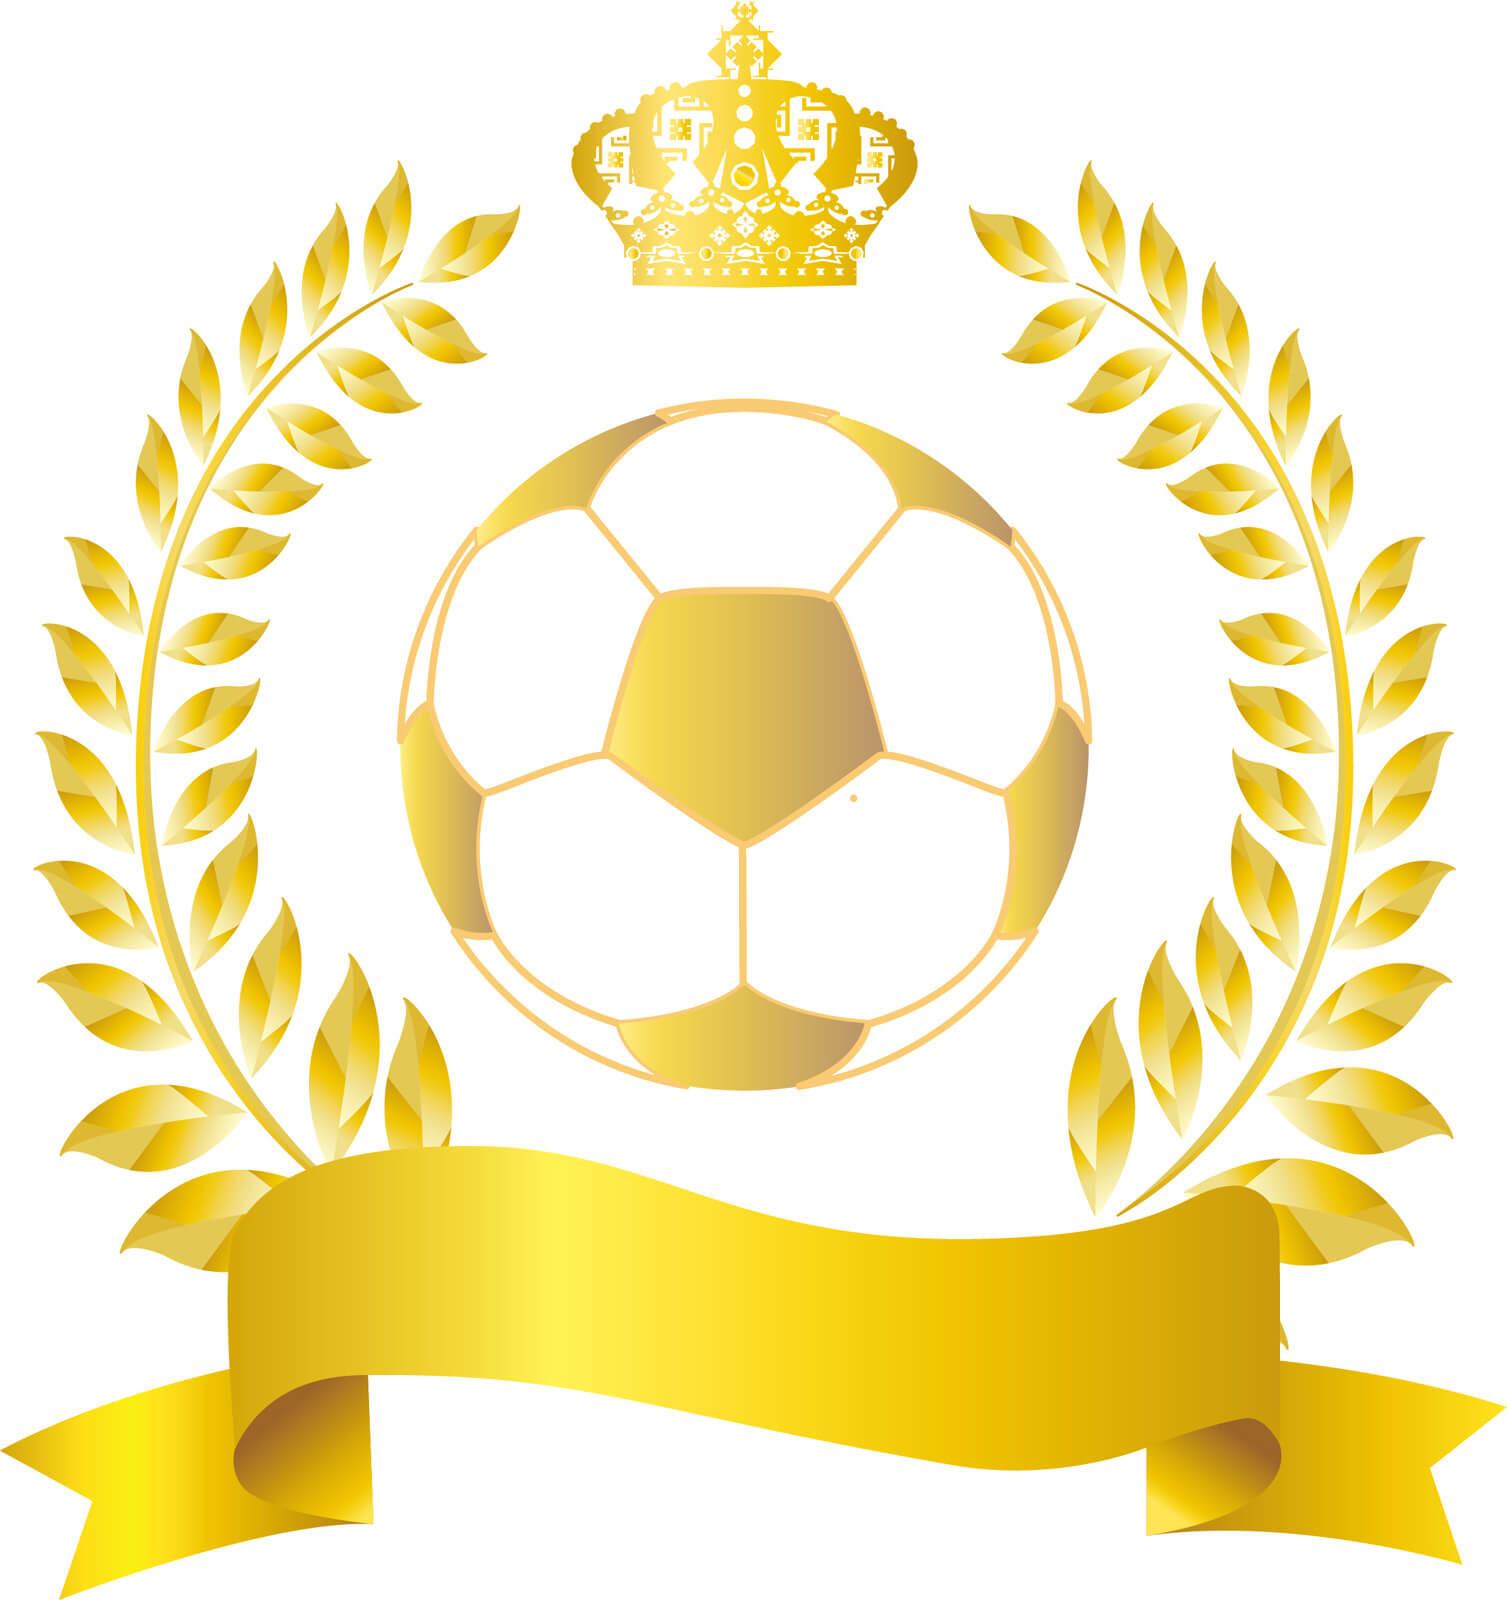 FIFA2018ワールドカップ開催!「キャプテン翼」の世界に置き換えて勝敗予想してみる!【後半】